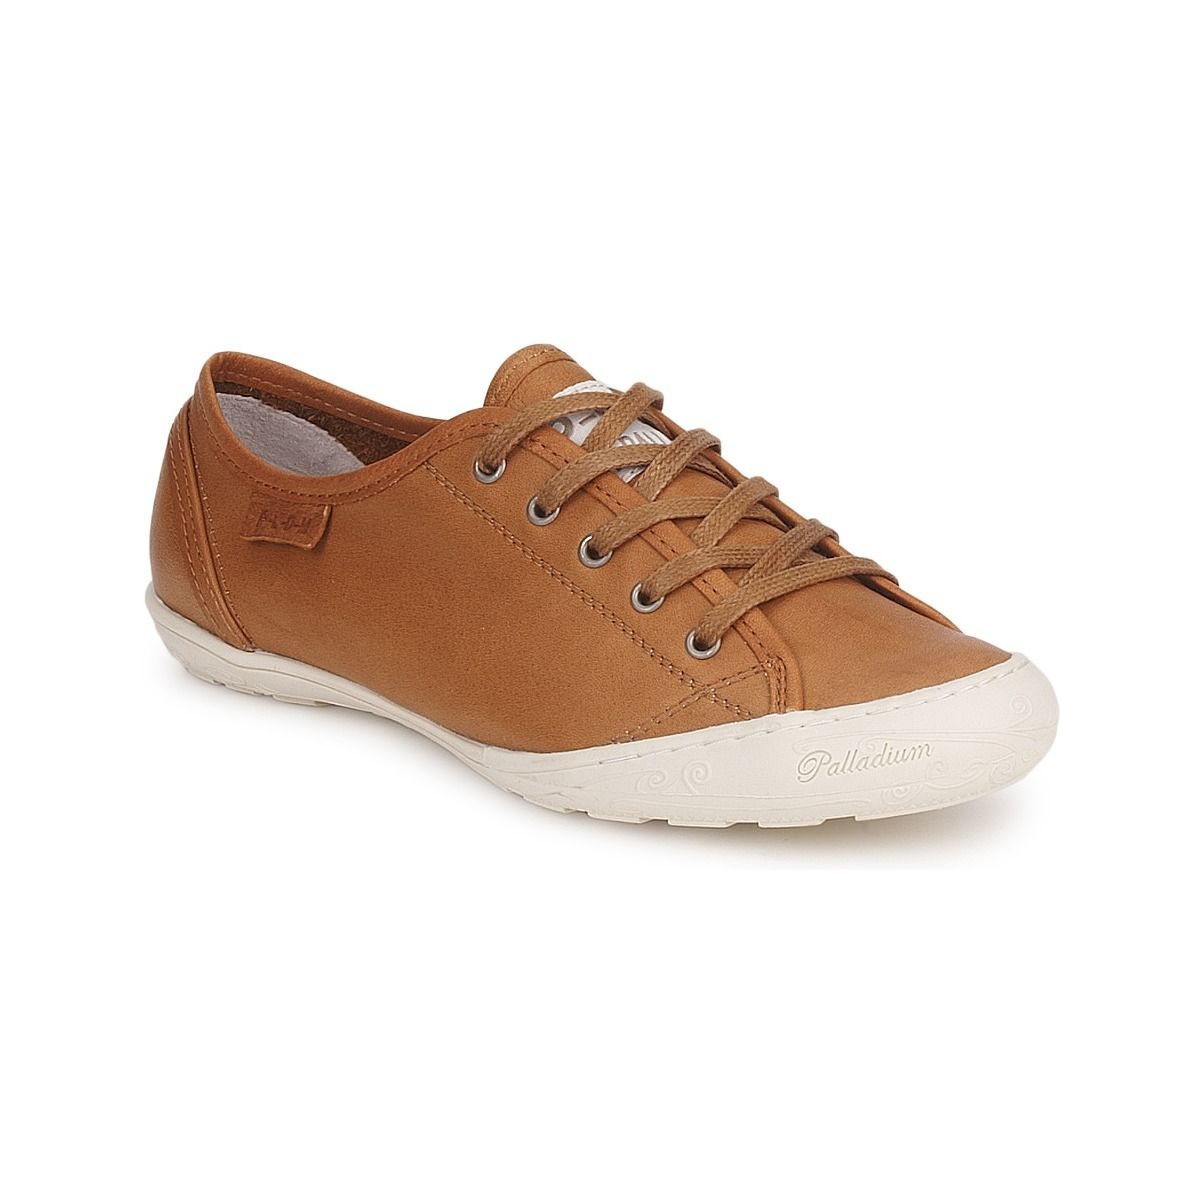 a311e20843b Deportivas de caña baja Palladium GAME CASH marrón - Entrega gratuita con  Spartoo.es ! - Zapatos Mujer 68